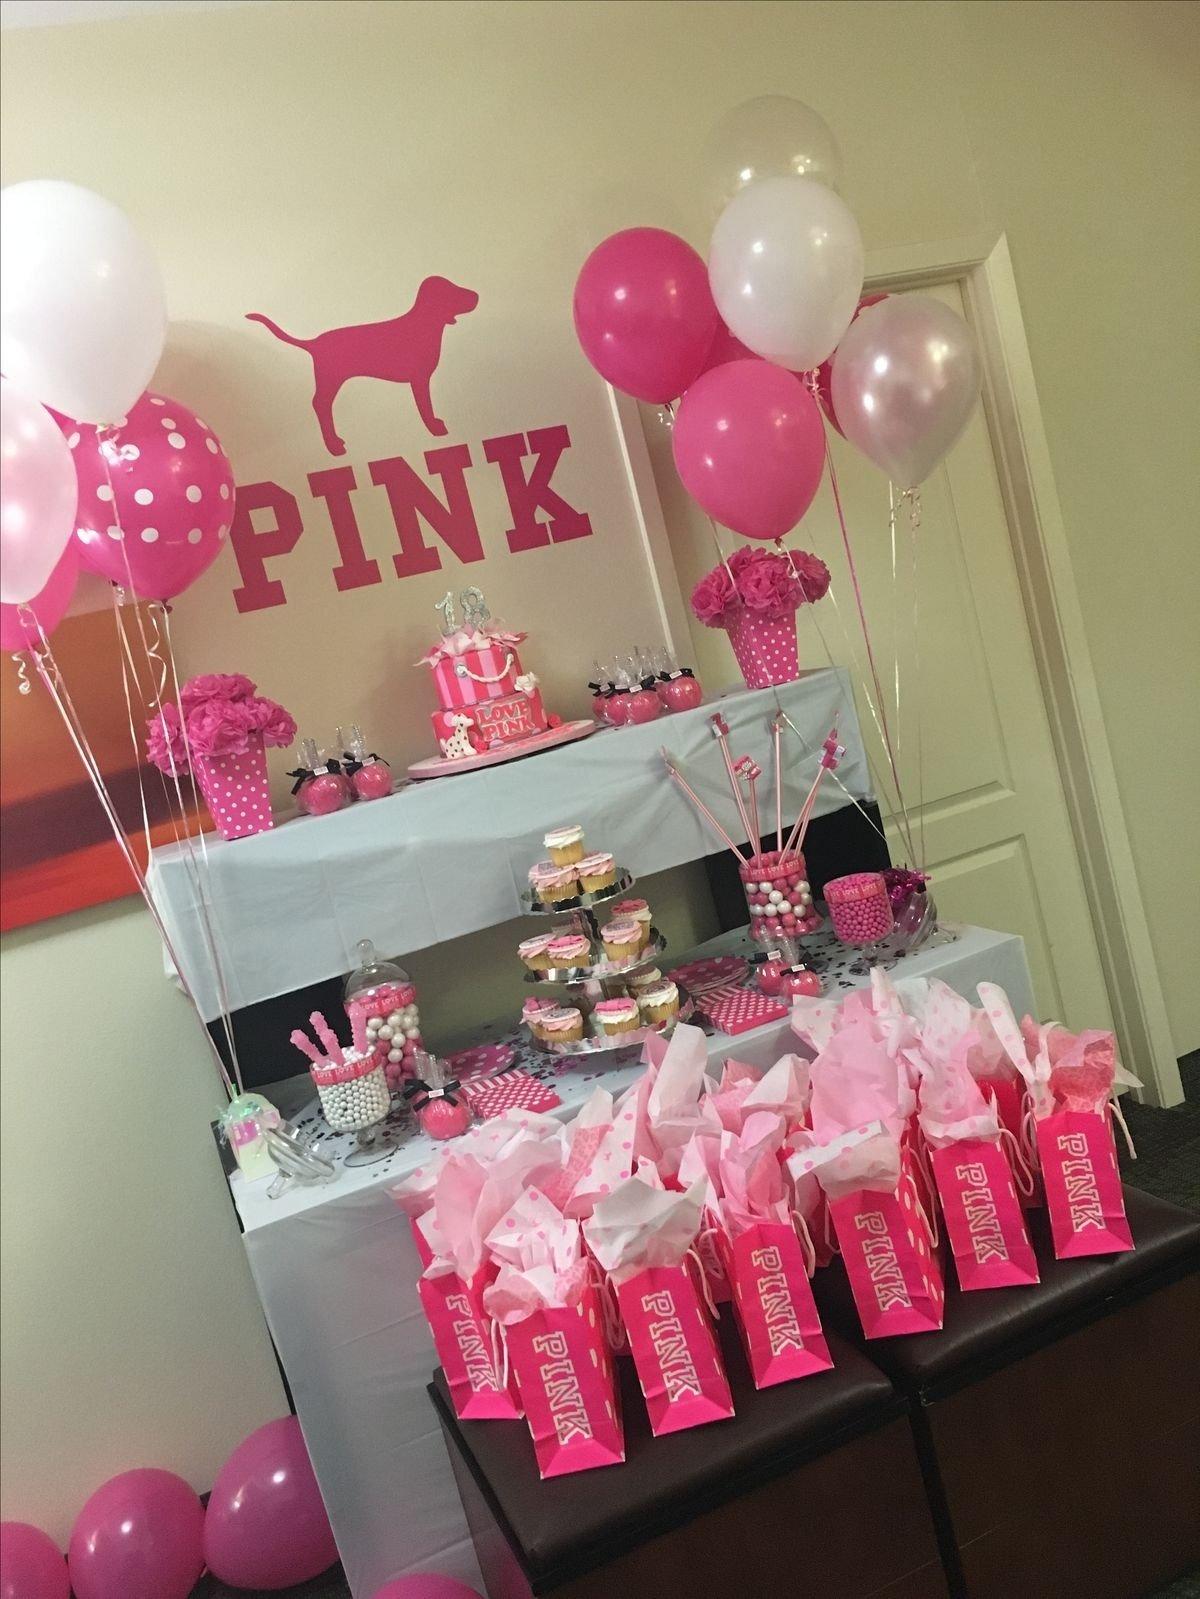 10 Stylish Birthday Ideas For 13 Year Old Girl themes birthday good ideas for a 13 year old birthday party girl 13 2020